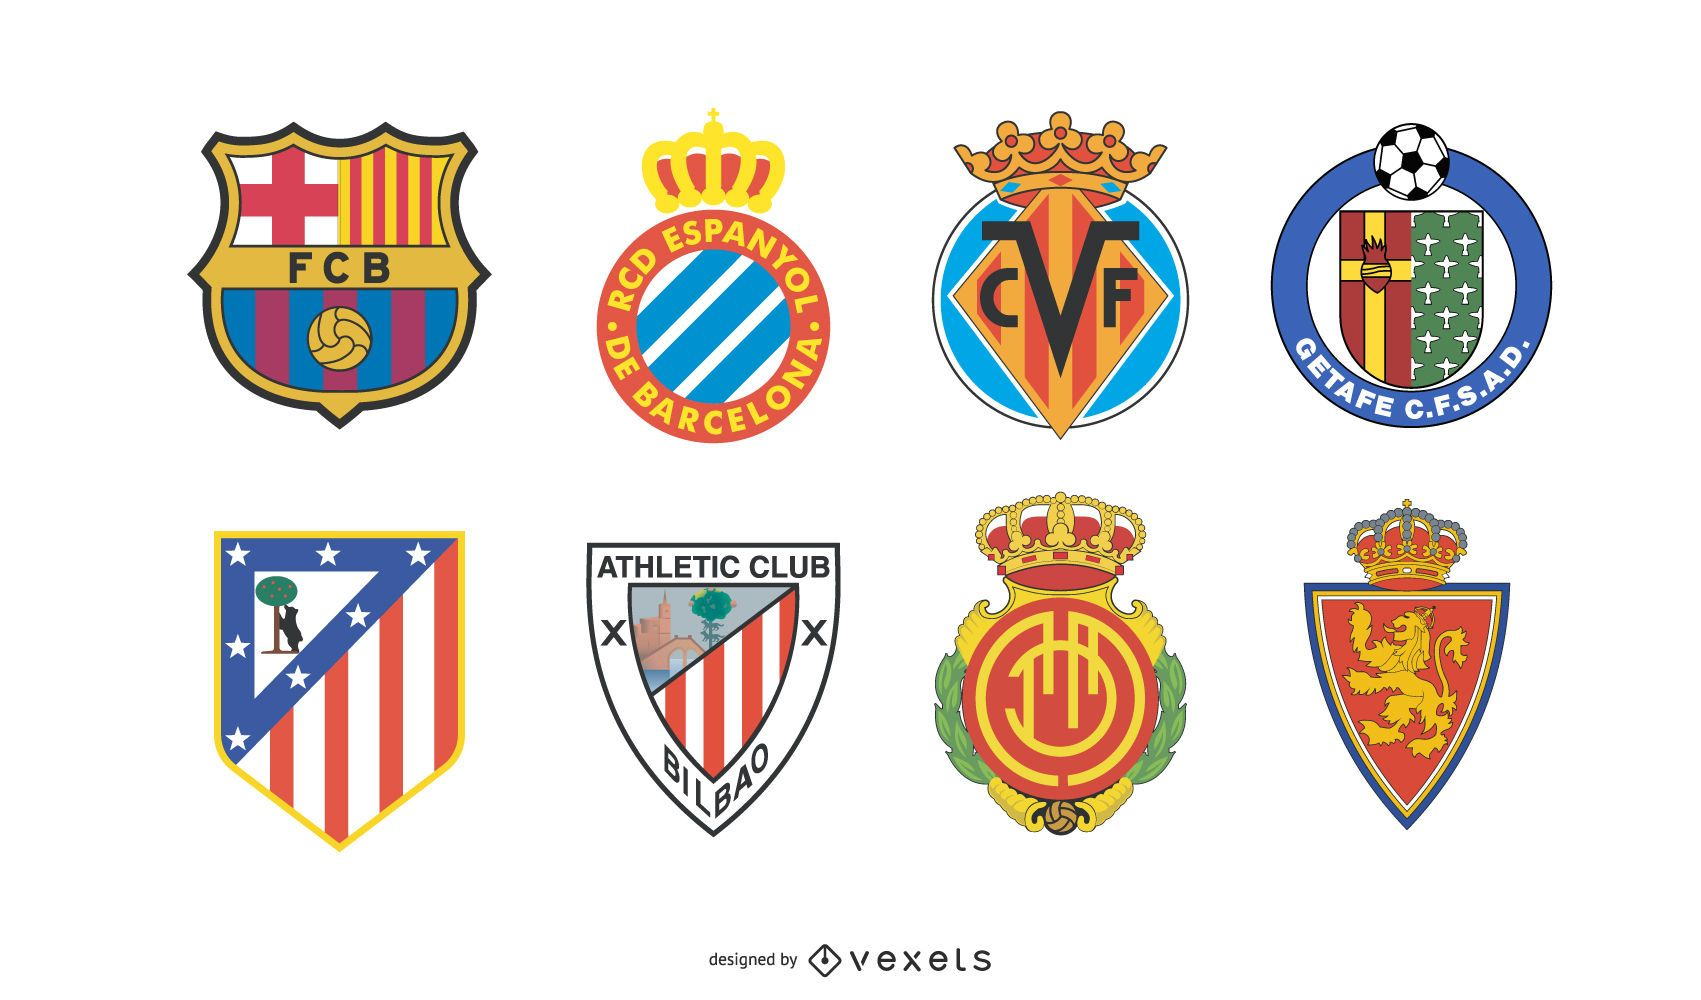 Logos der spanischen Fu?ballmannschaft